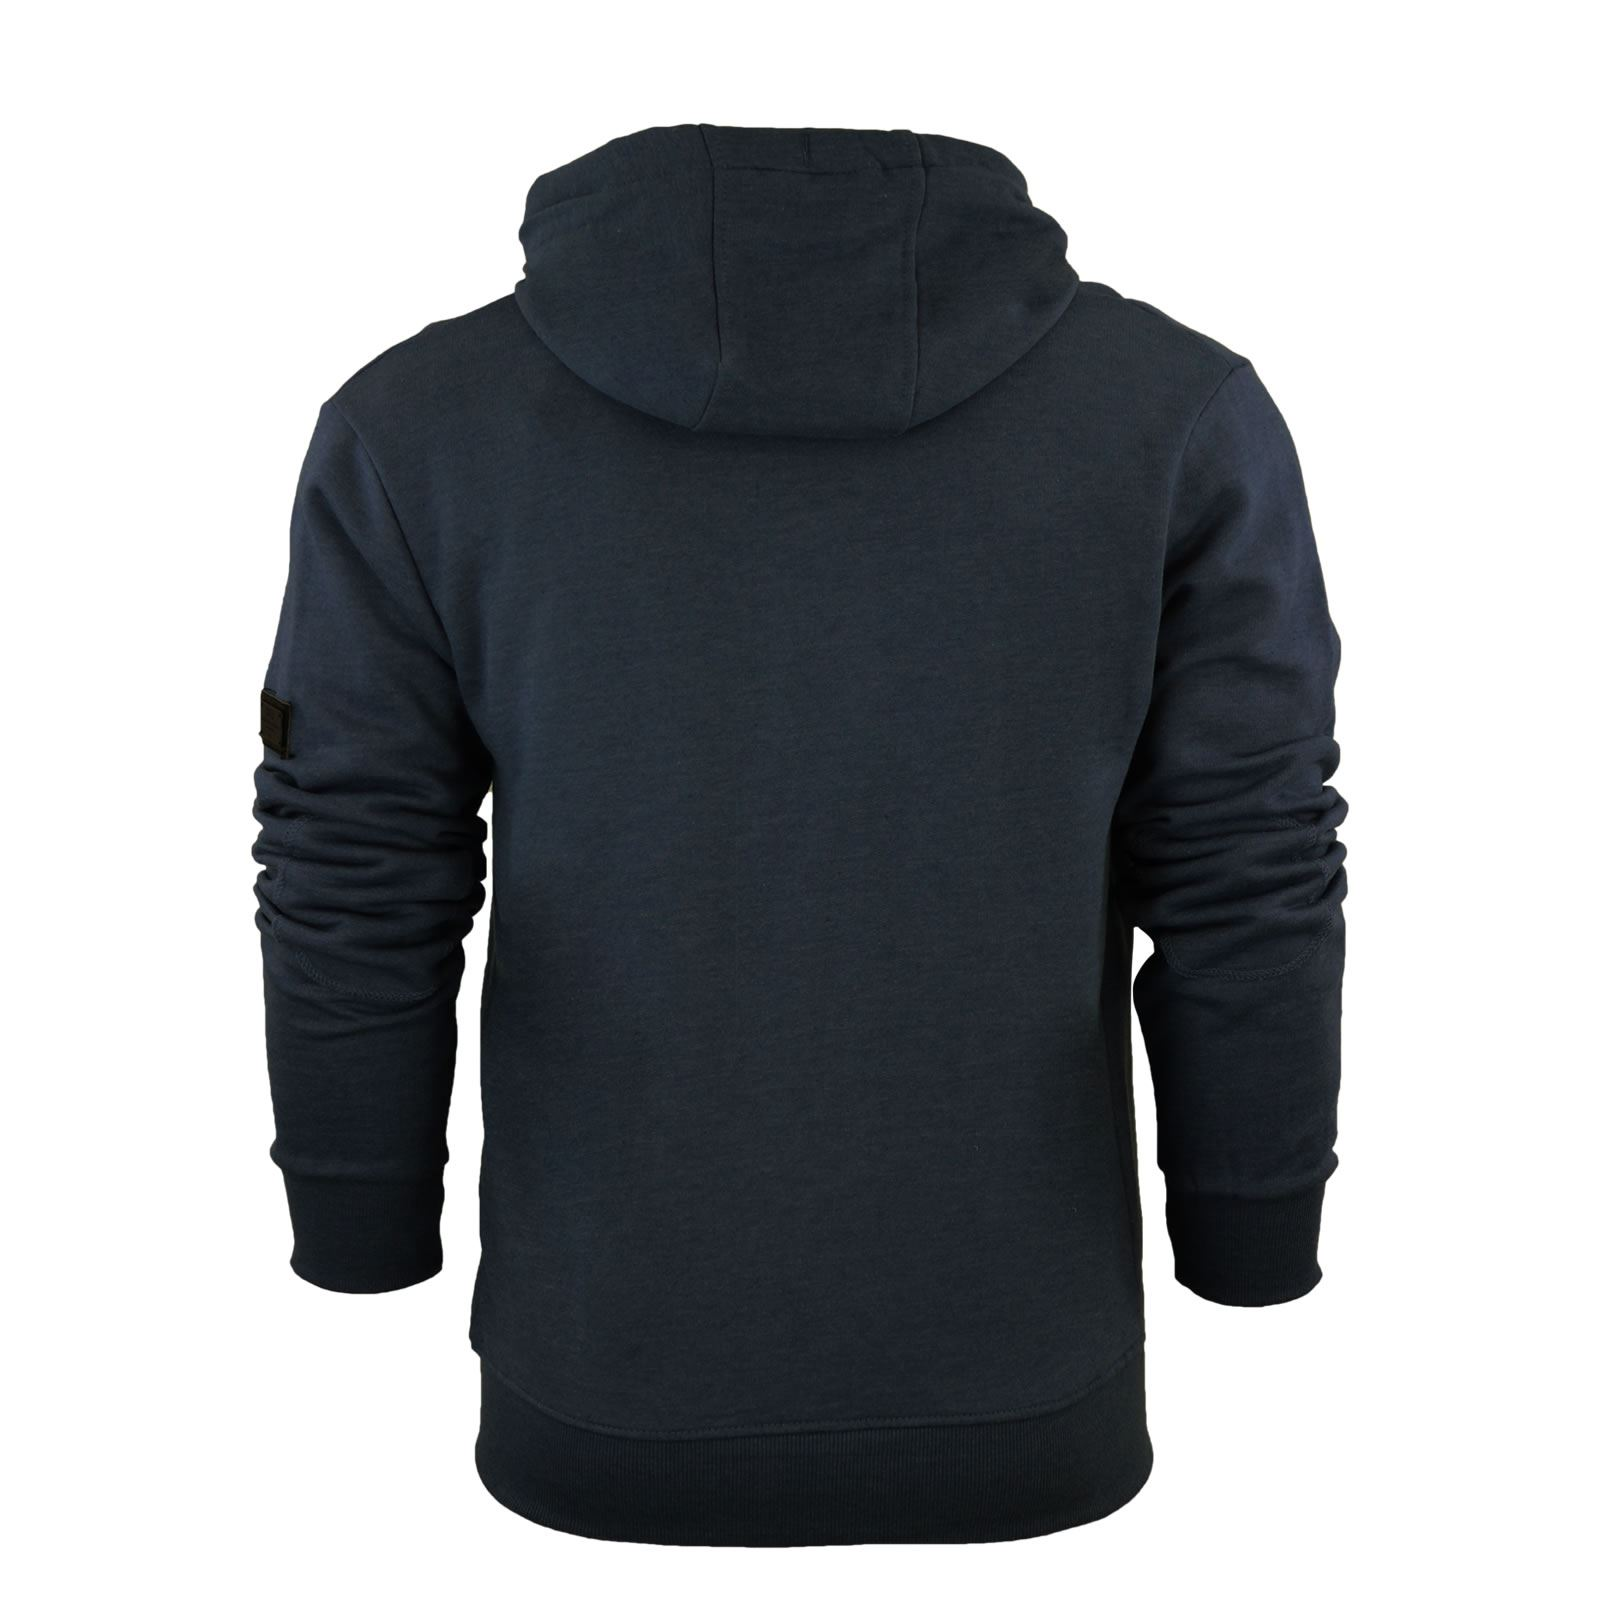 Mens-Hoodie-Smith-amp-Jones-Zip-Up-Hooded-Sweater-Jumper thumbnail 33